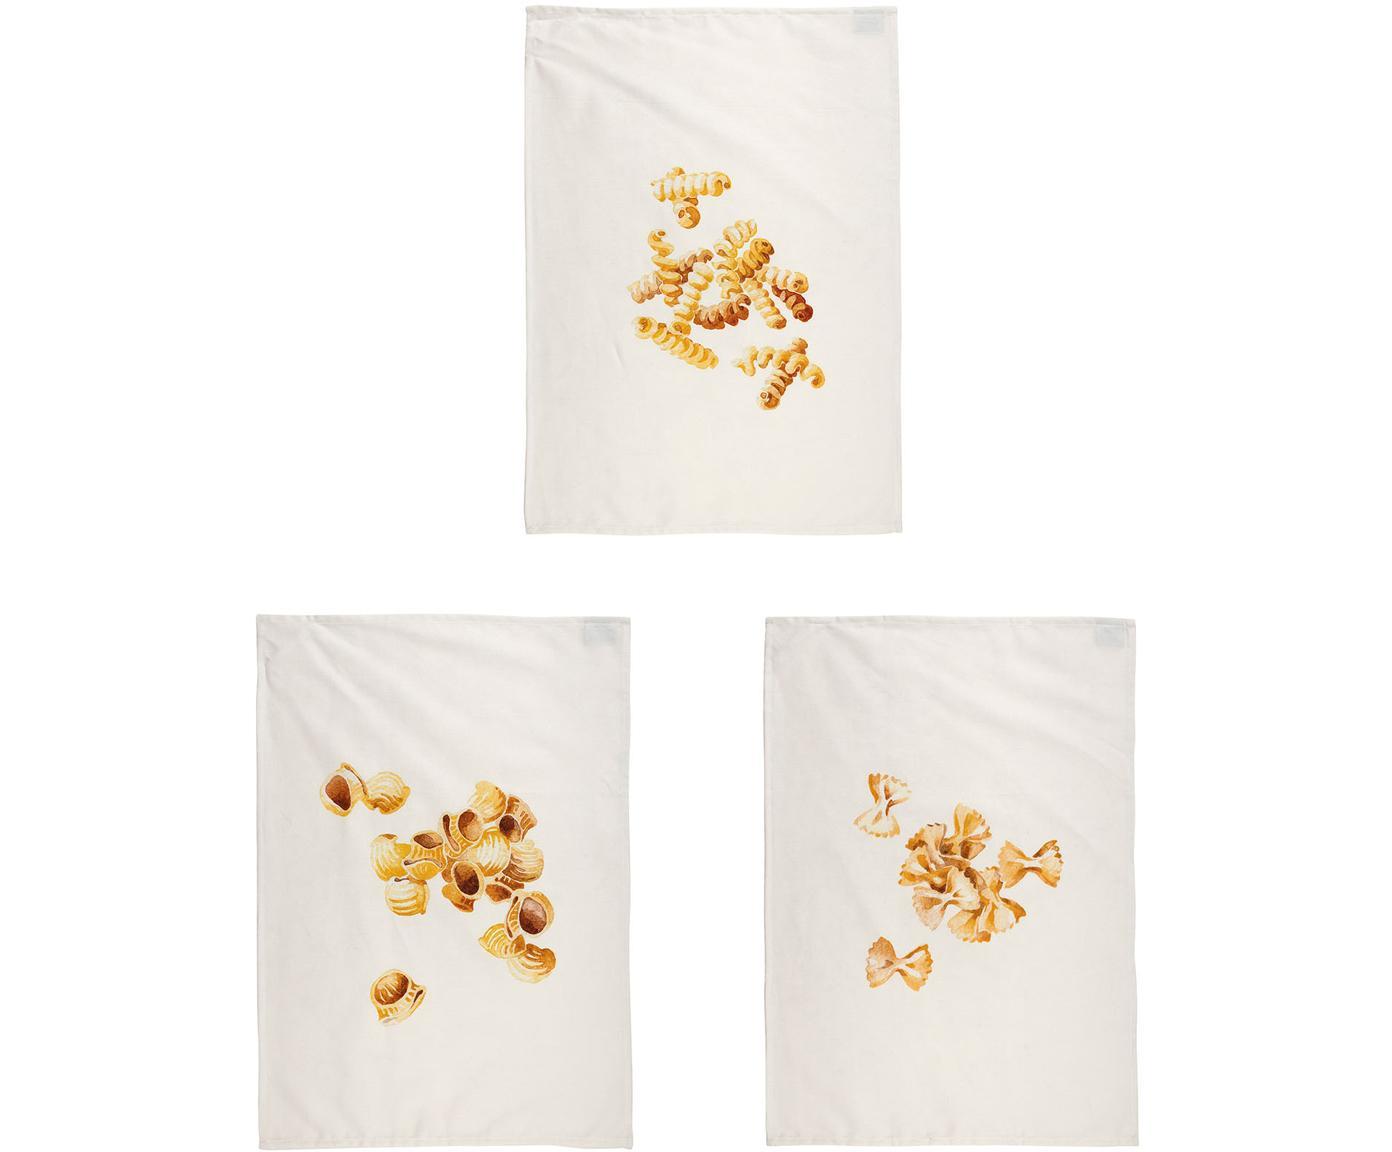 Set de paños de cocina Pasta, 3pzas., 100%algodón, Blanco, amarillo, An 50 x L 70 cm